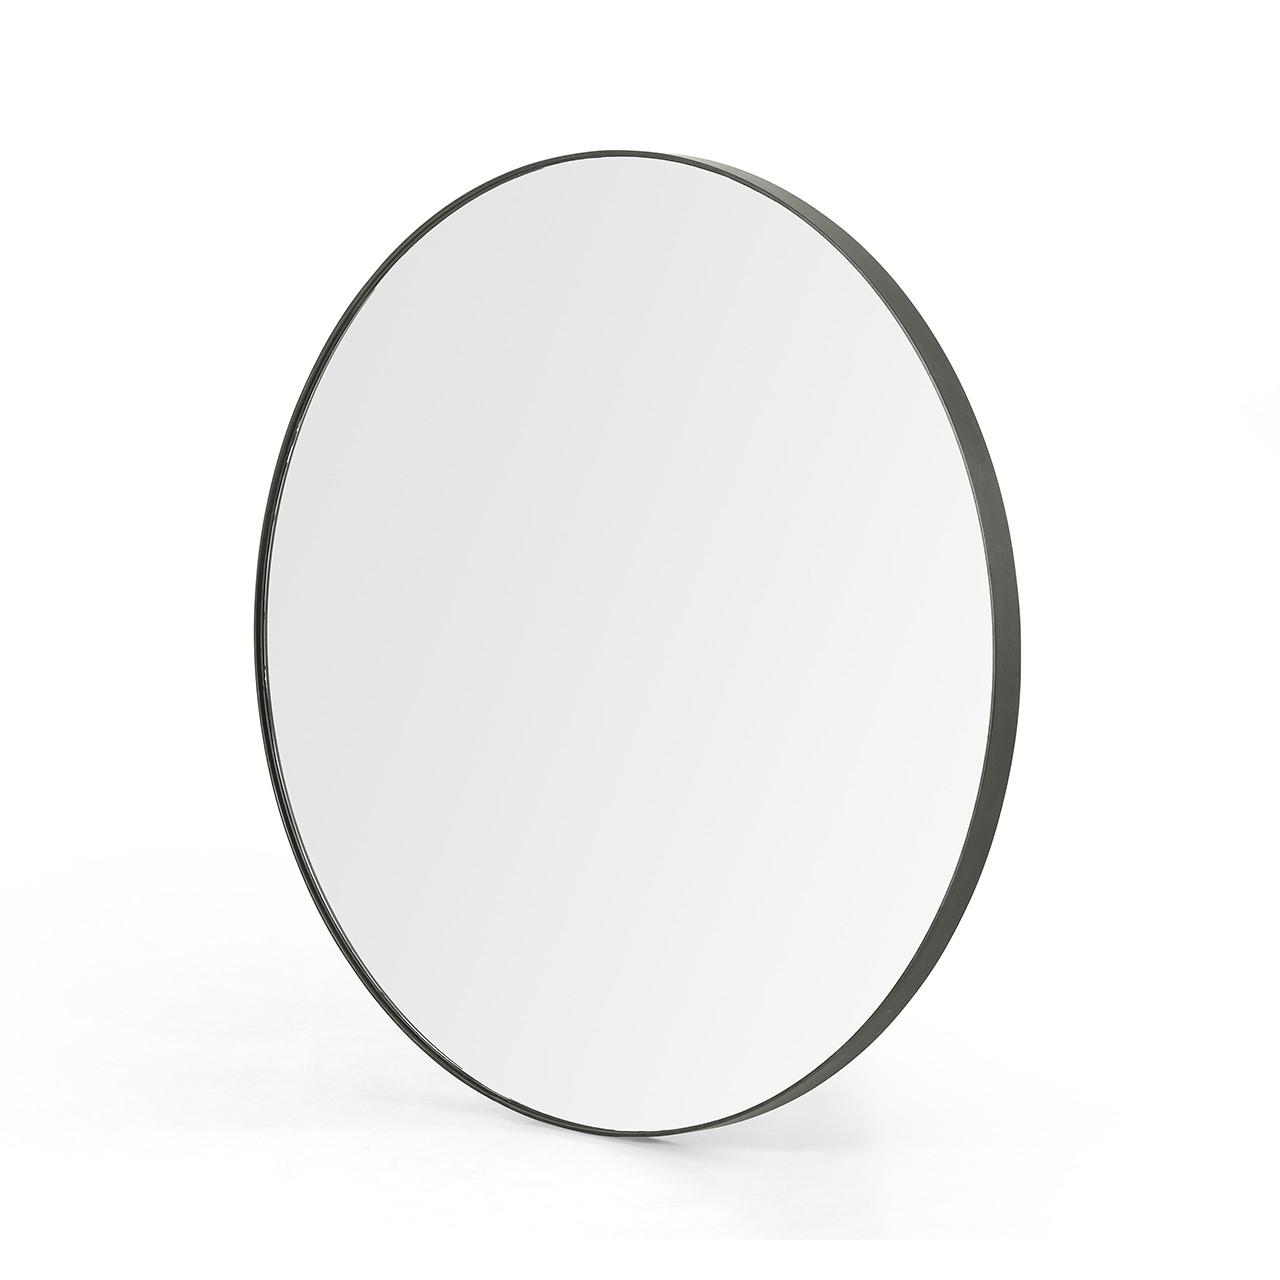 Berlin Round Mirror - Rustic Black